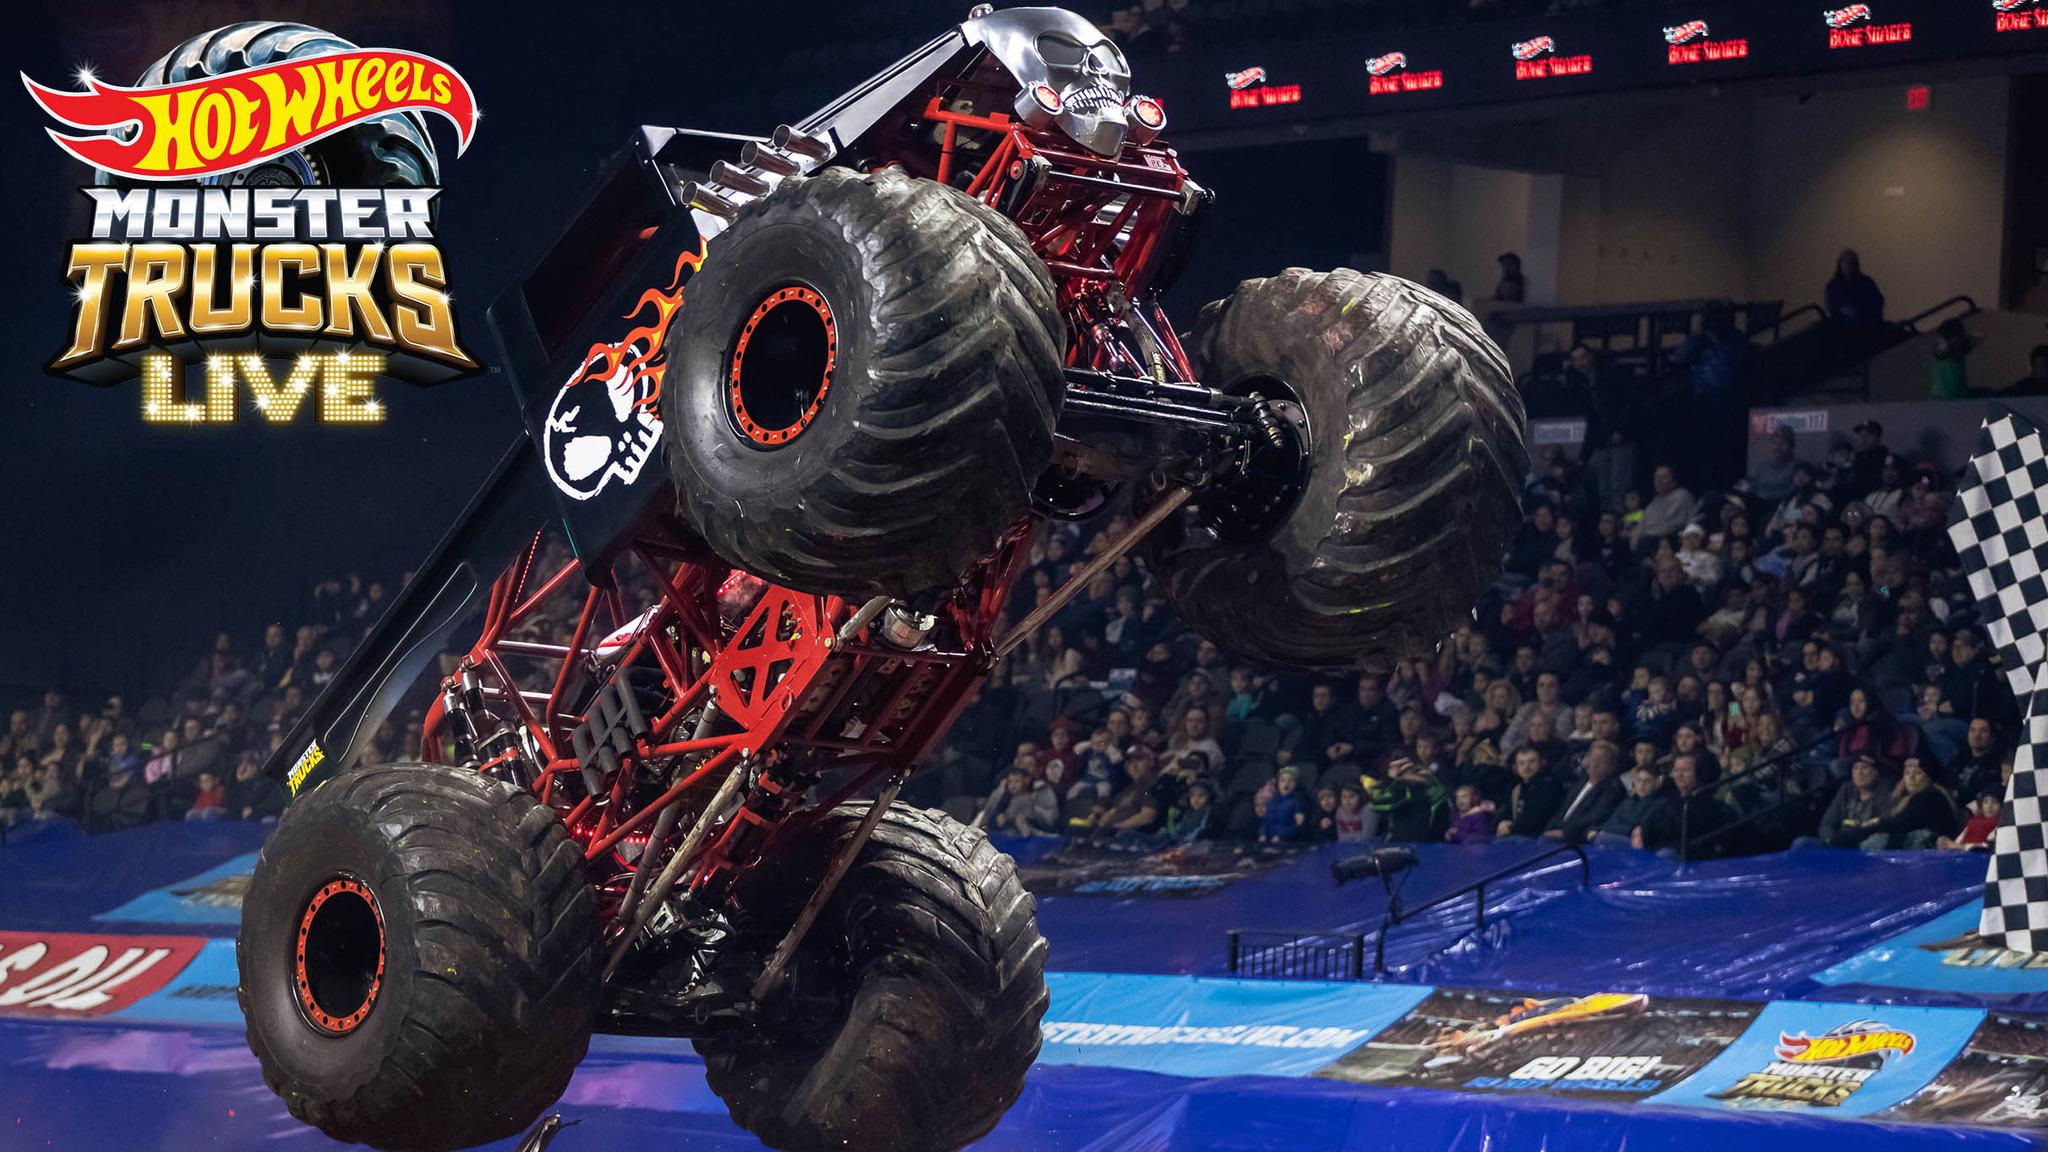 Hot Wheels Monster Trucks Live Uk 2048x1152 Wallpaper Teahub Io